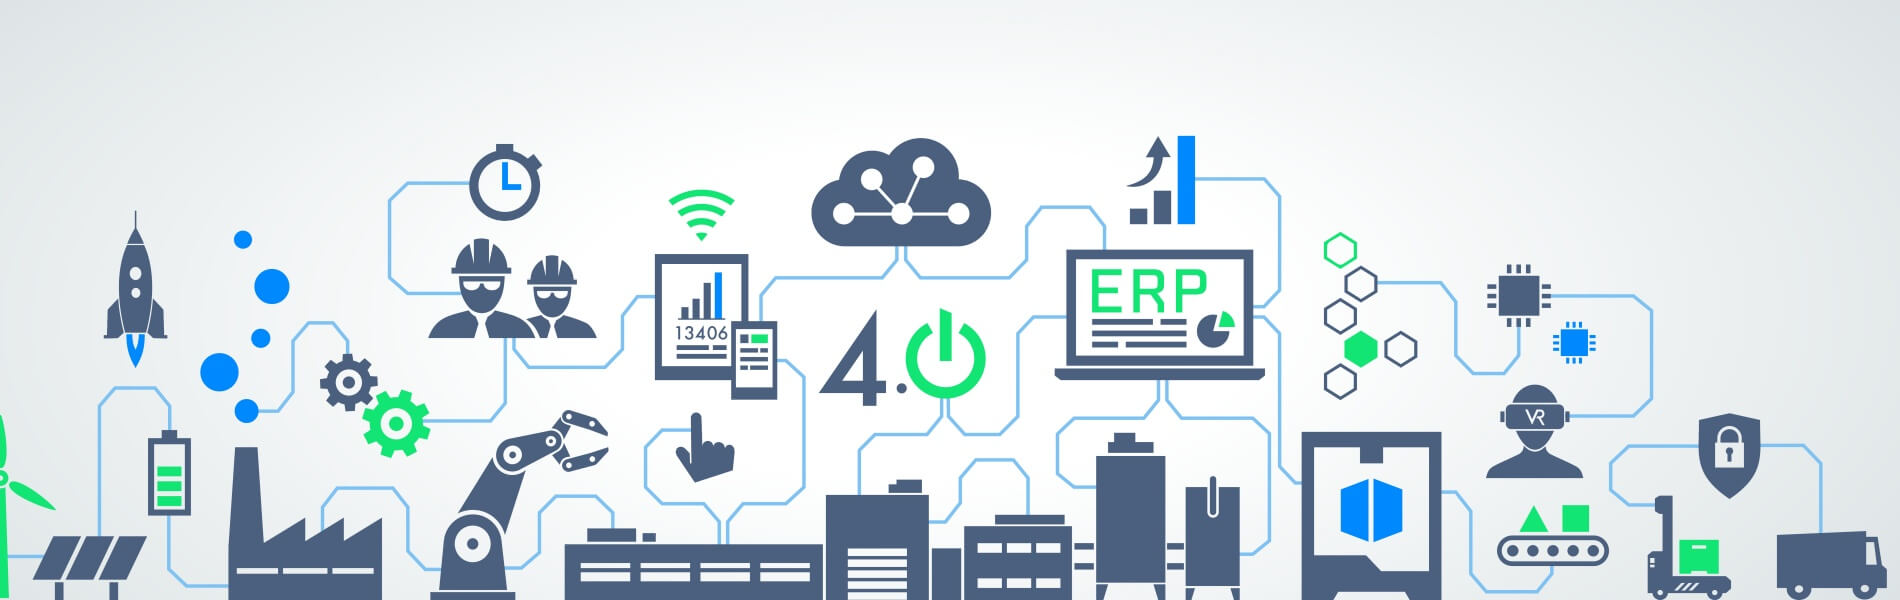 Digitale Transformation: Wie digital ist die Logistik-Branche?